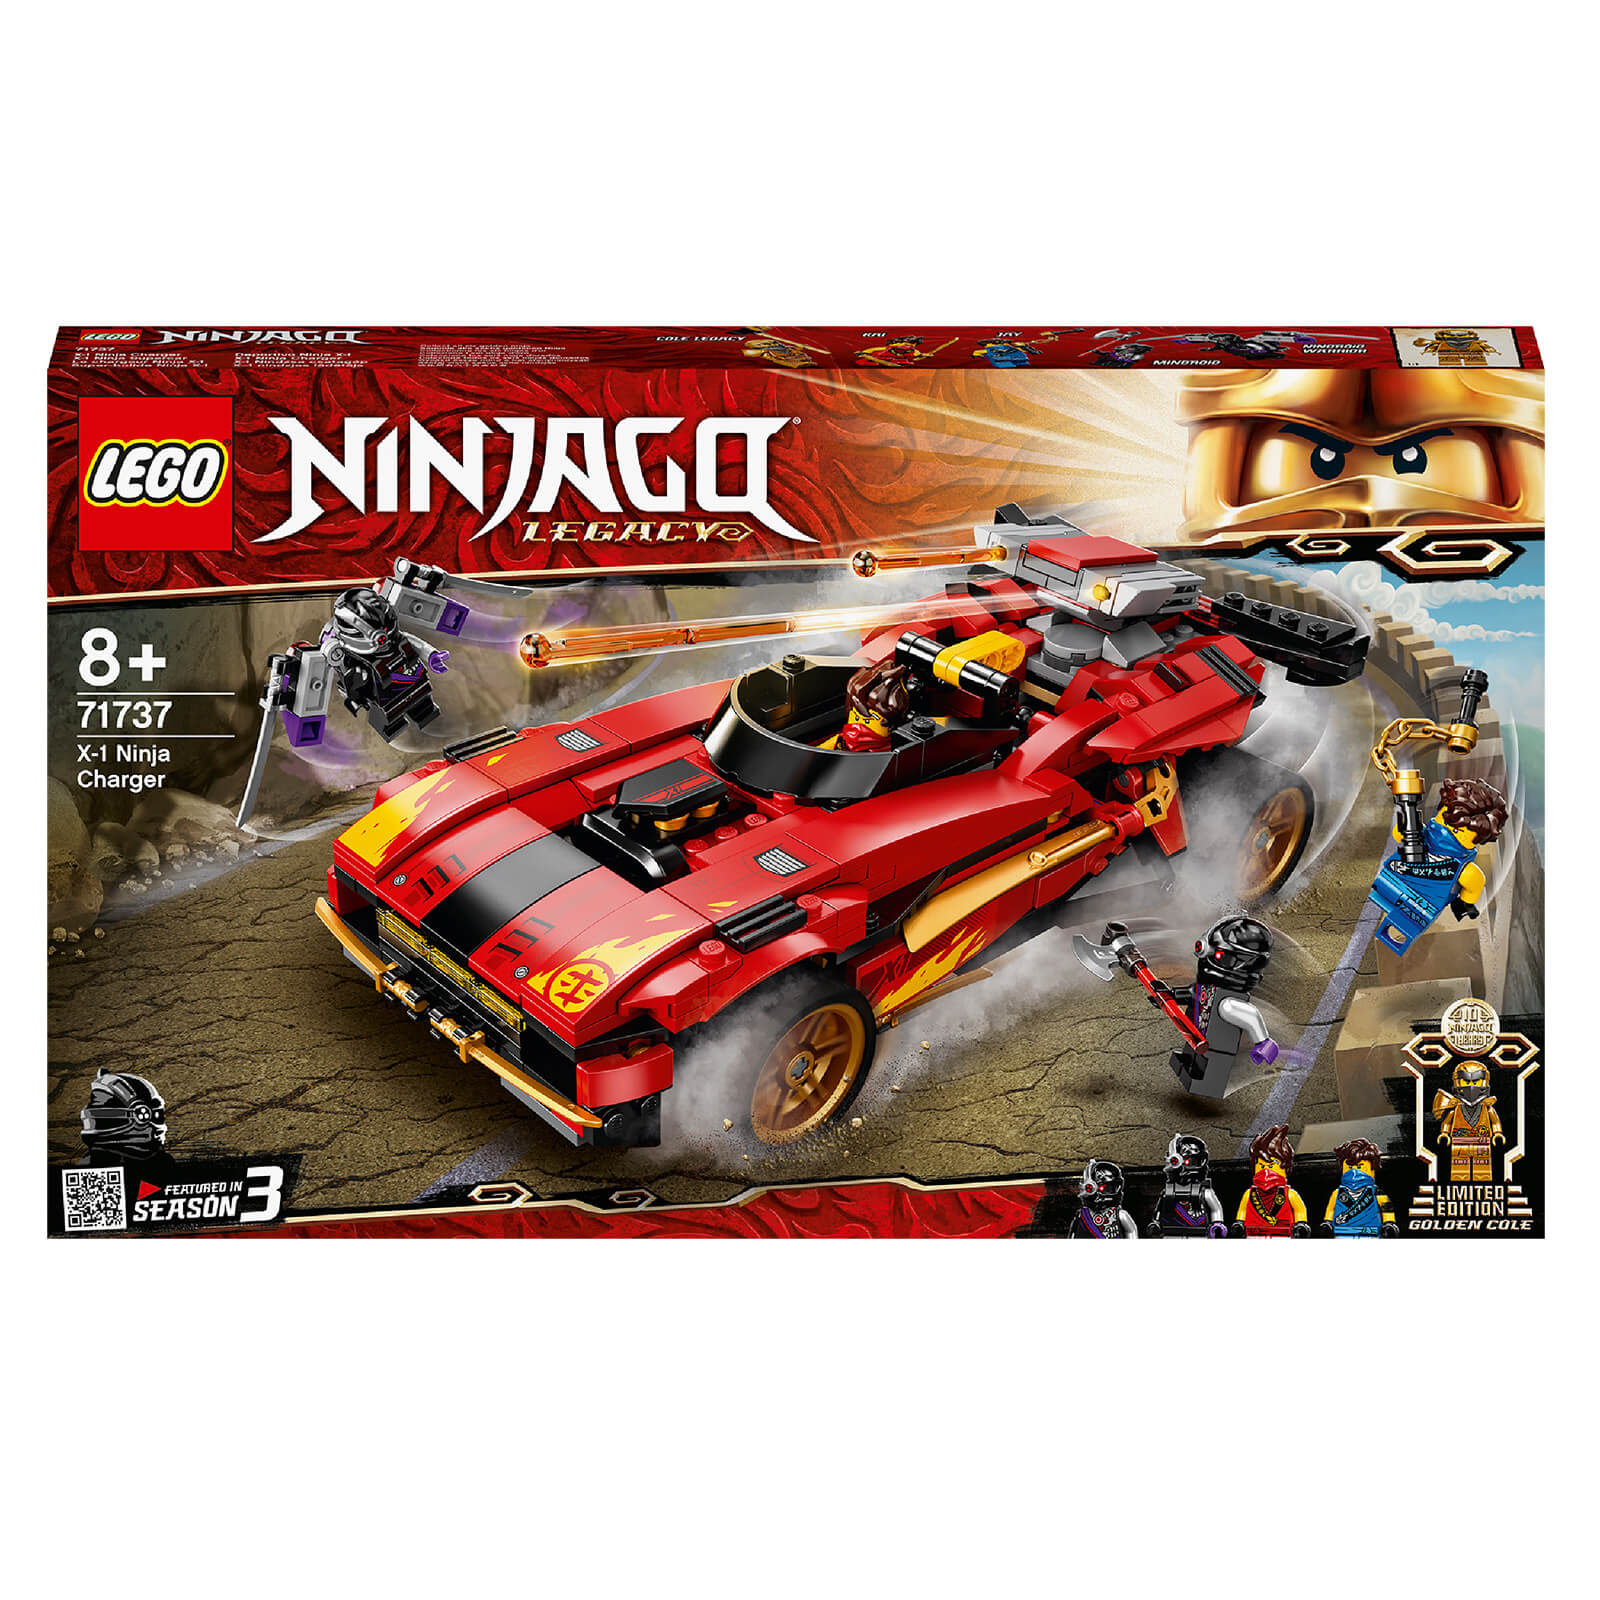 Image of Lego Ninjago Legacy X Ninja Charger Construction Set